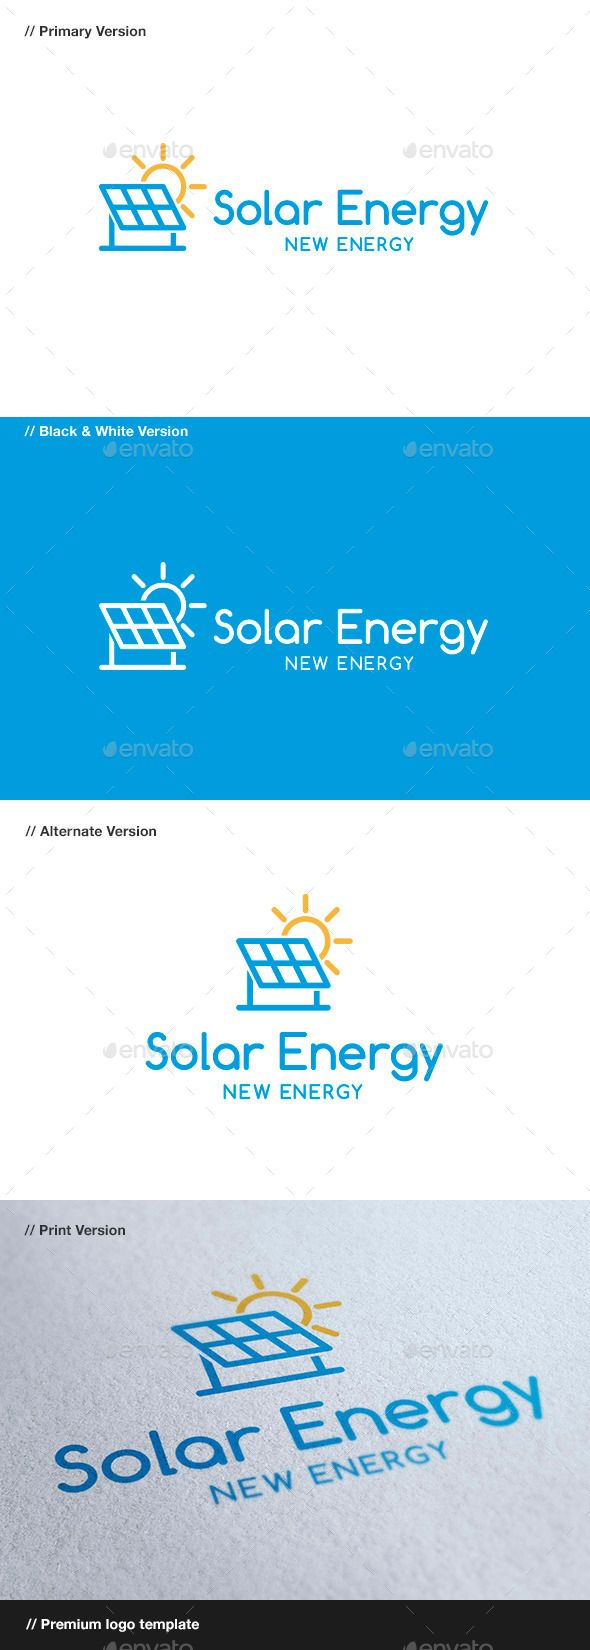 Solar Energy - Logo Design Template Vector #logotype Download it here: http://graphicriver.net/item/solar-energy/8866314?s_rank=1061?ref=nexion